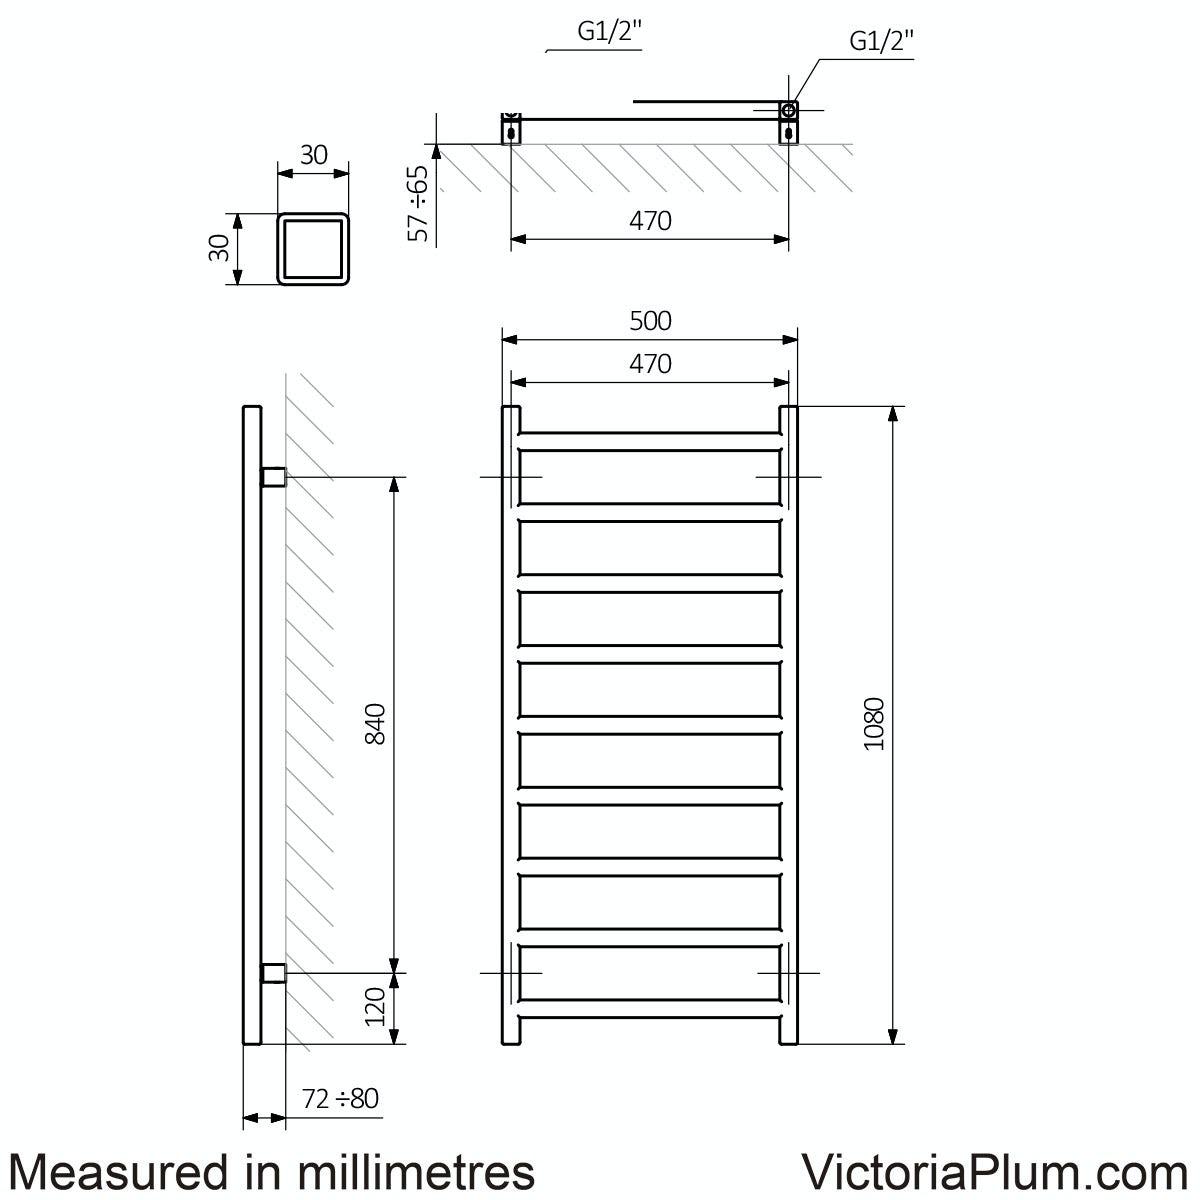 Dimensions for Terma Simple meteor black heated towel rail 1080 x 500